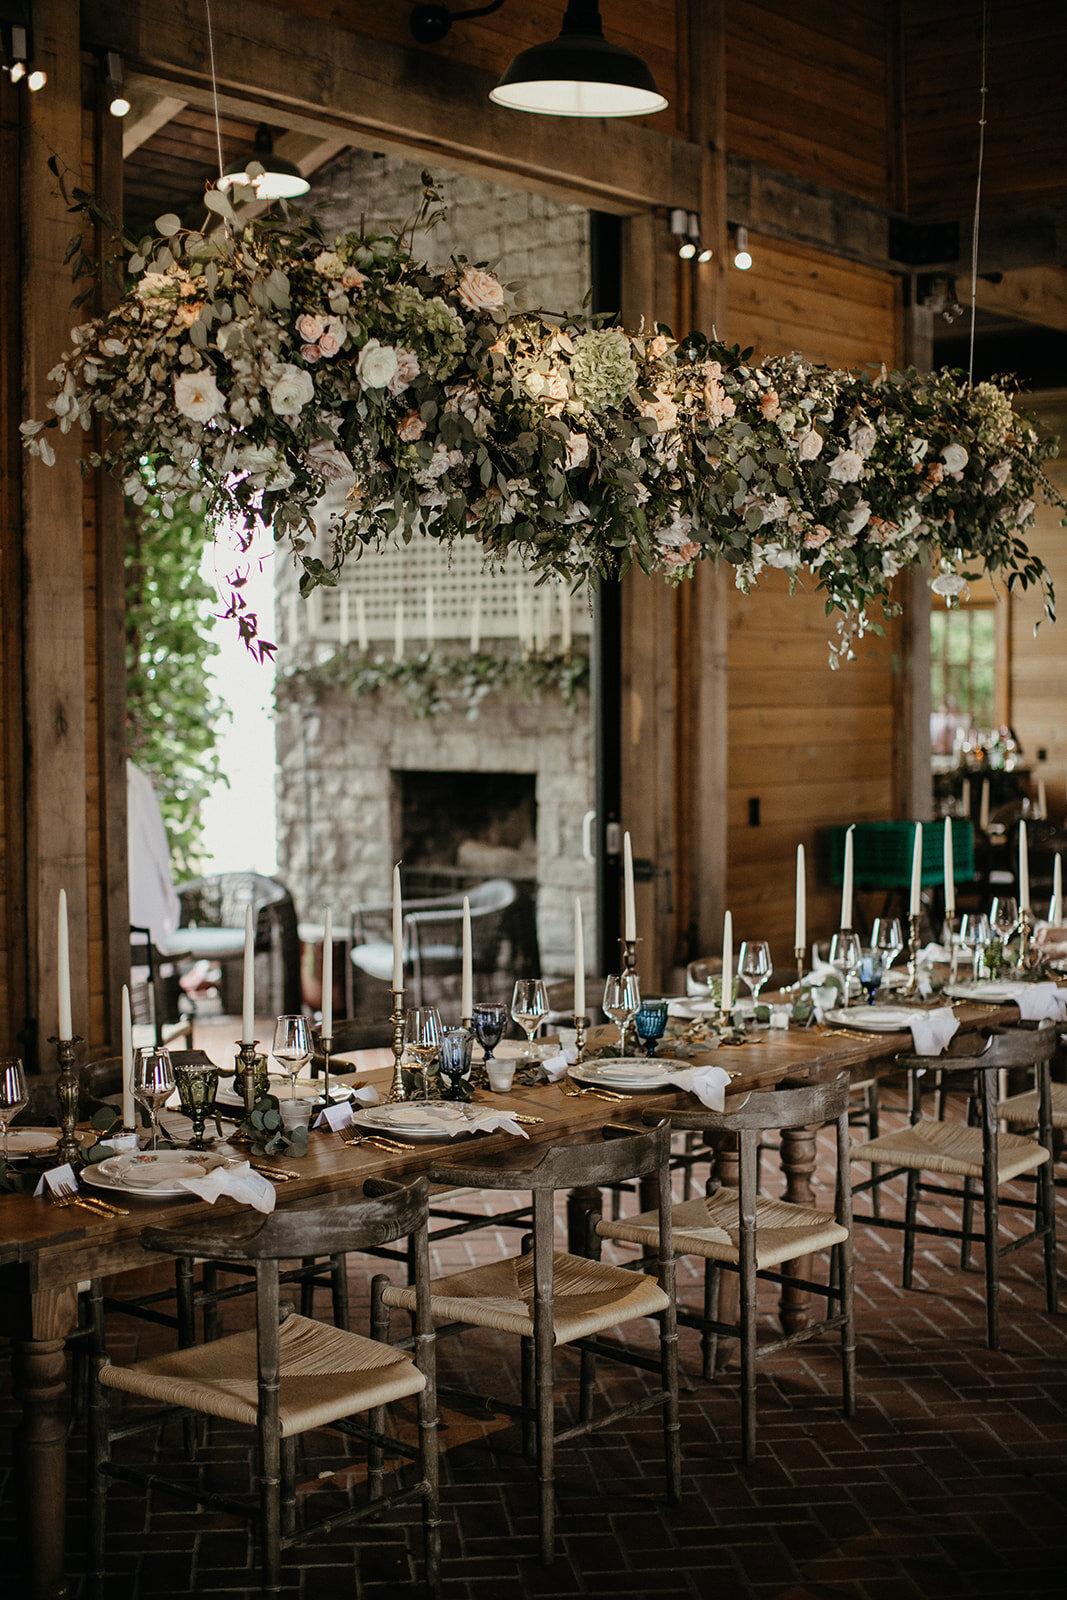 christi_john_wedding_1-1096_websize.jpg